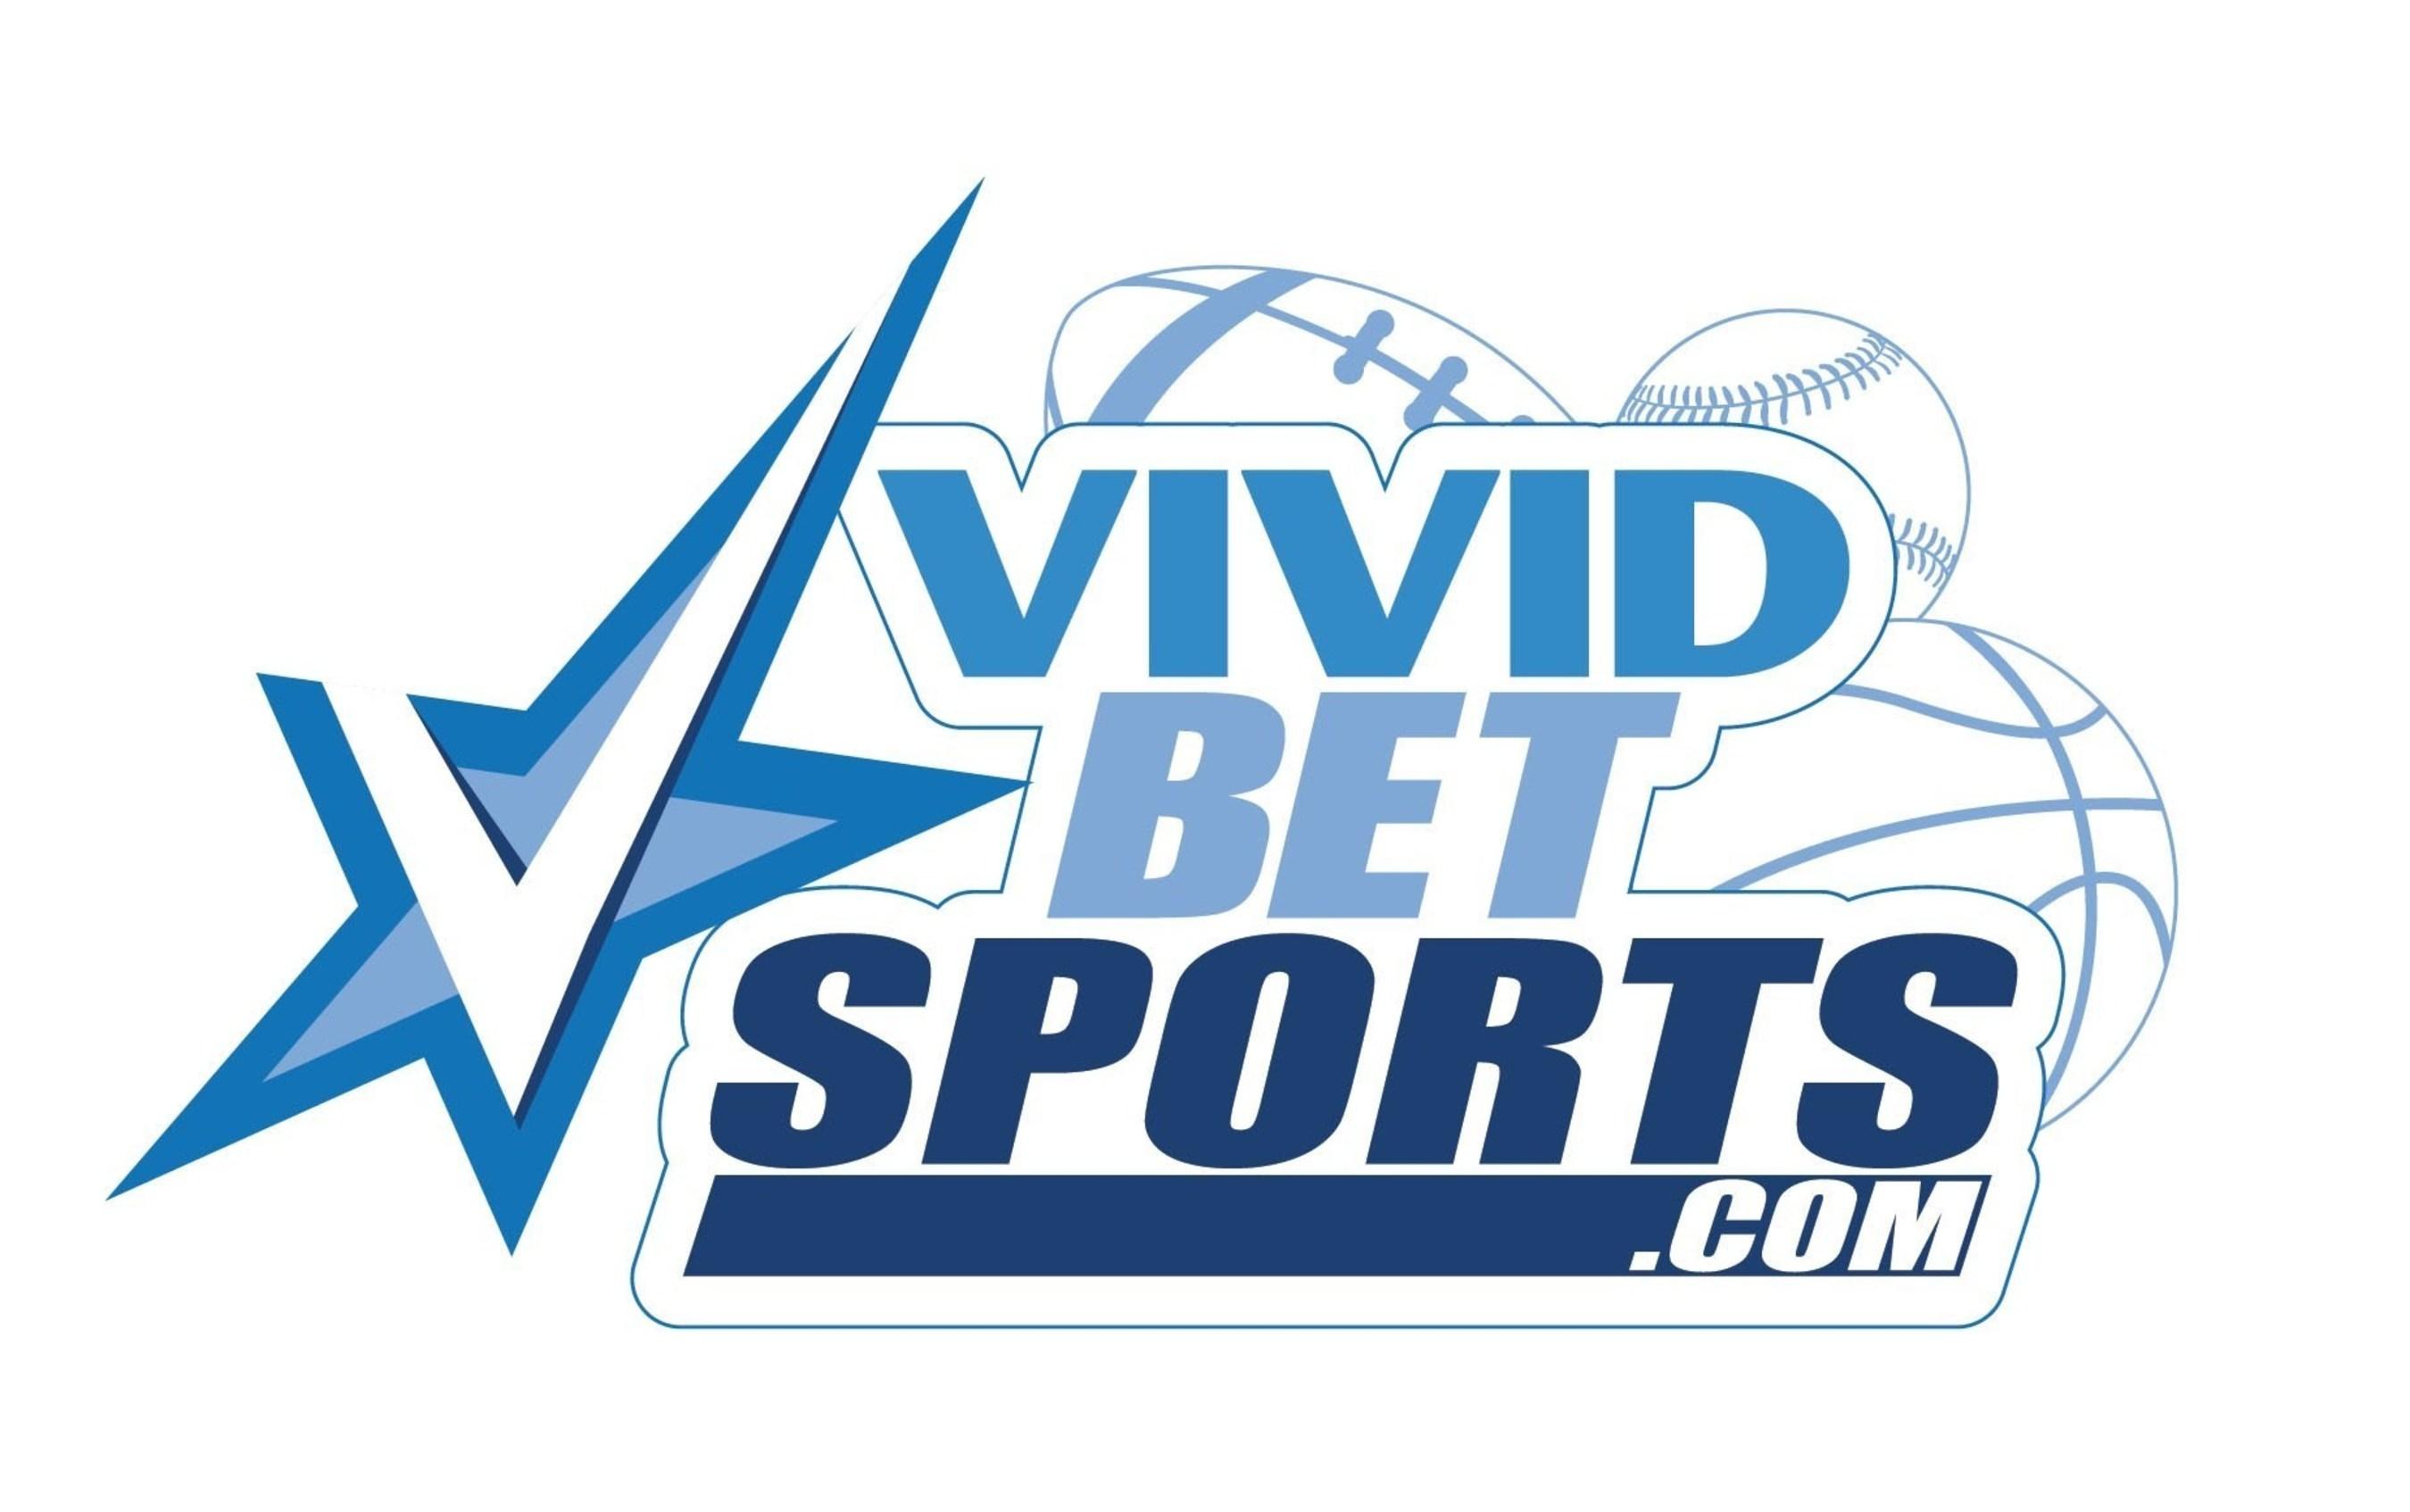 VividBetSports.com launches Jan. 31 with party at Vivid Cabaret NYC